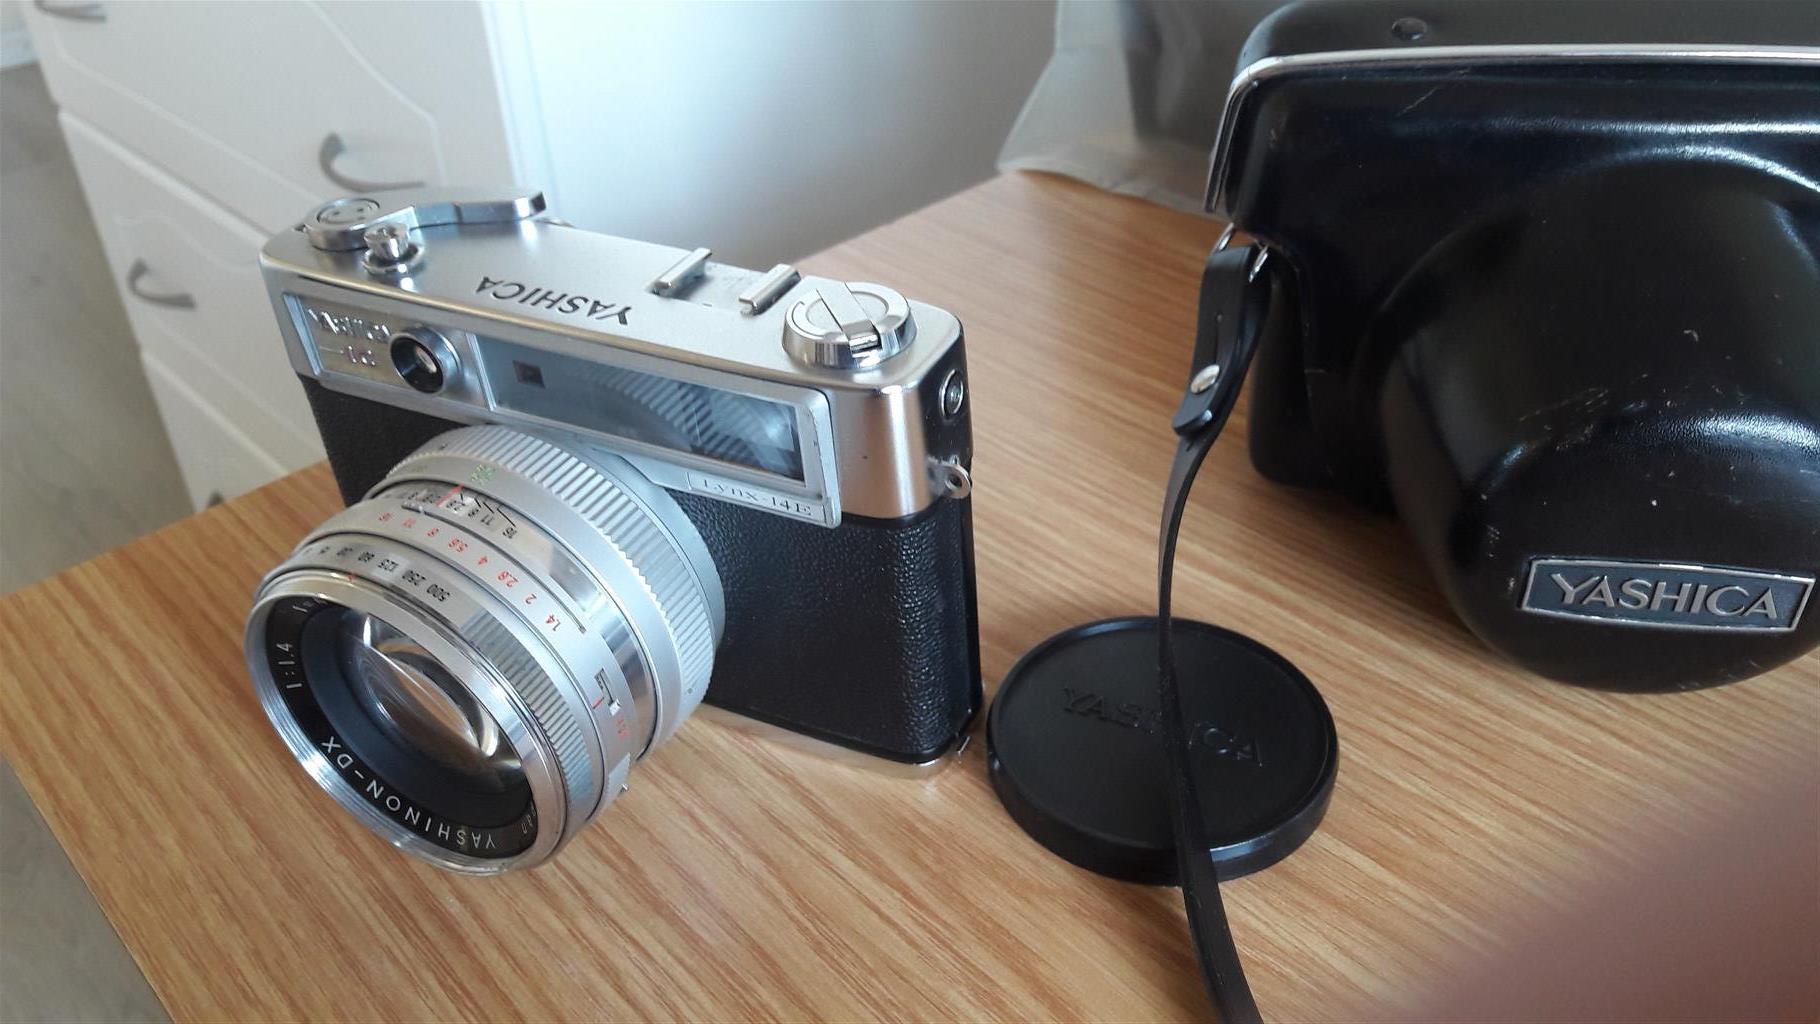 Film Cameras and lenses